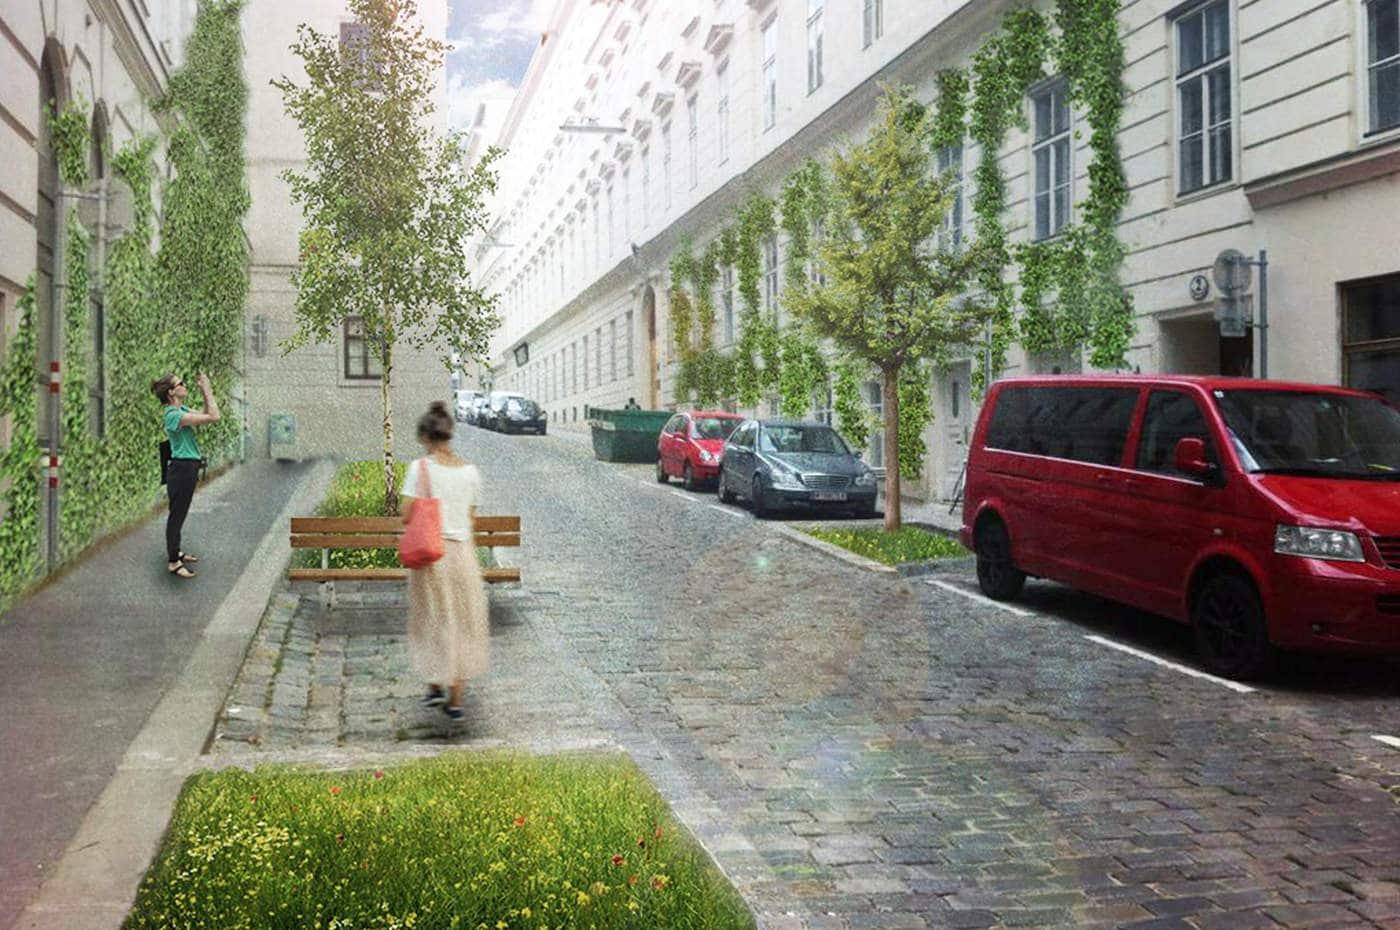 MK Landschaftsarchitektur - Projekt GoGreen